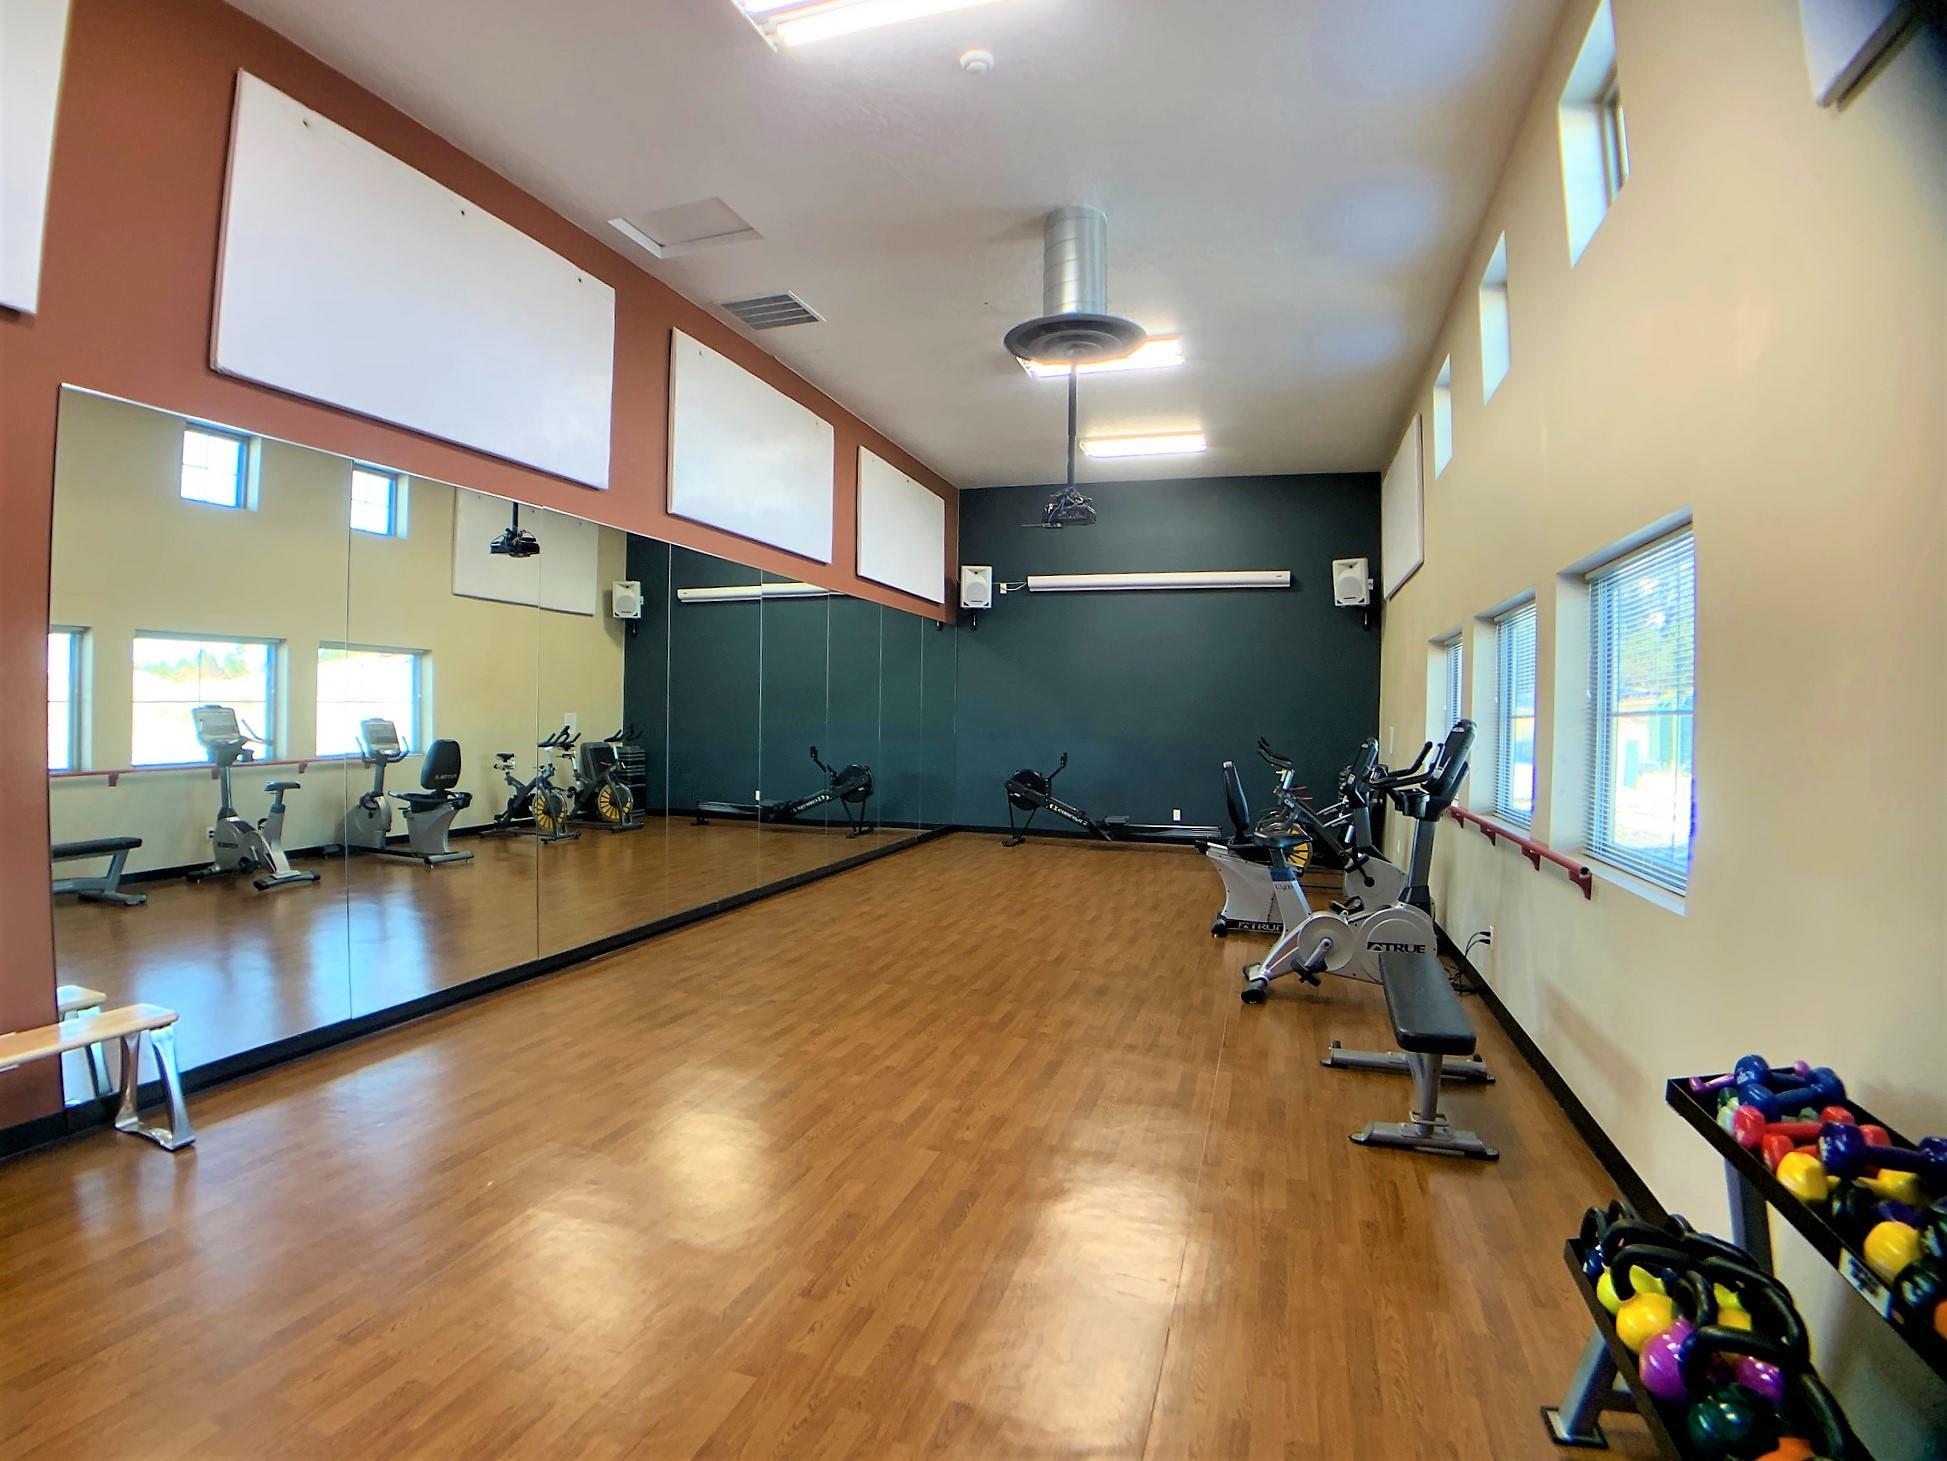 gym small mirror room 2